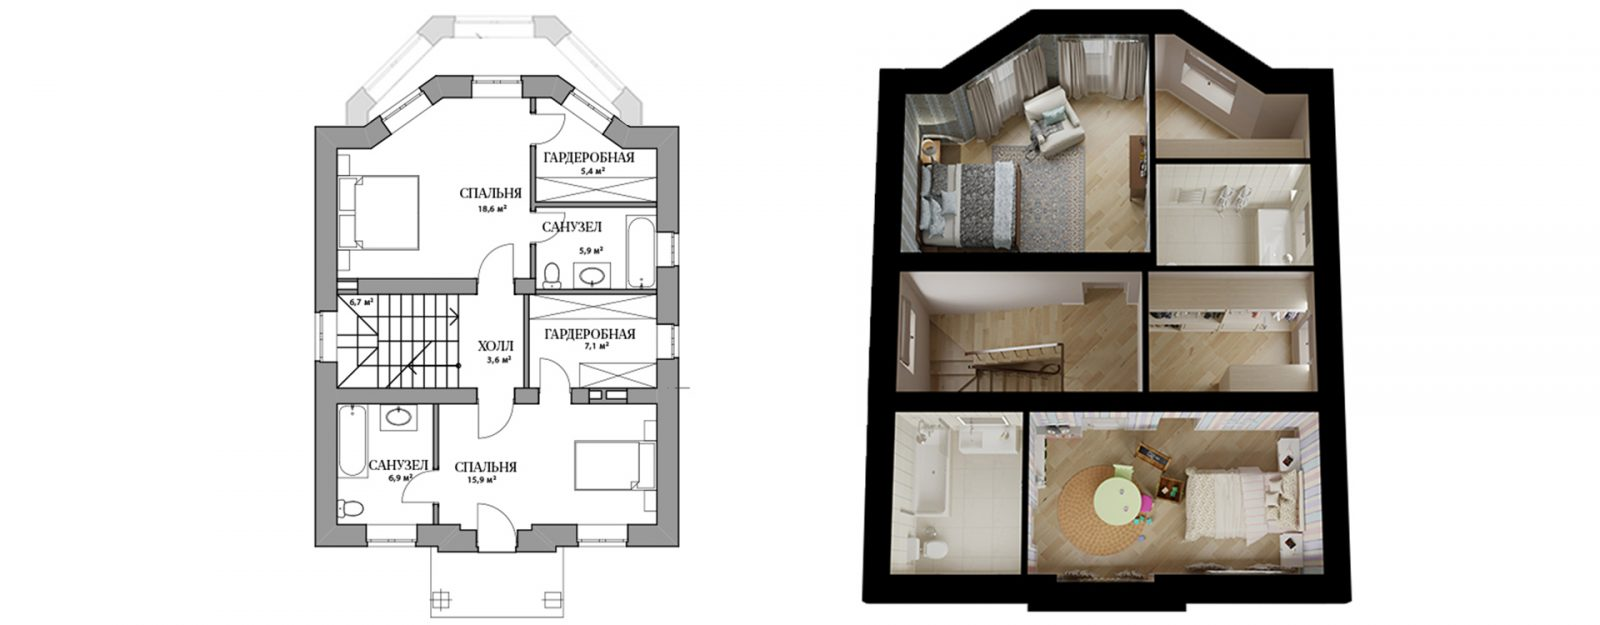 Коттедж «Одри» - план второго этажа